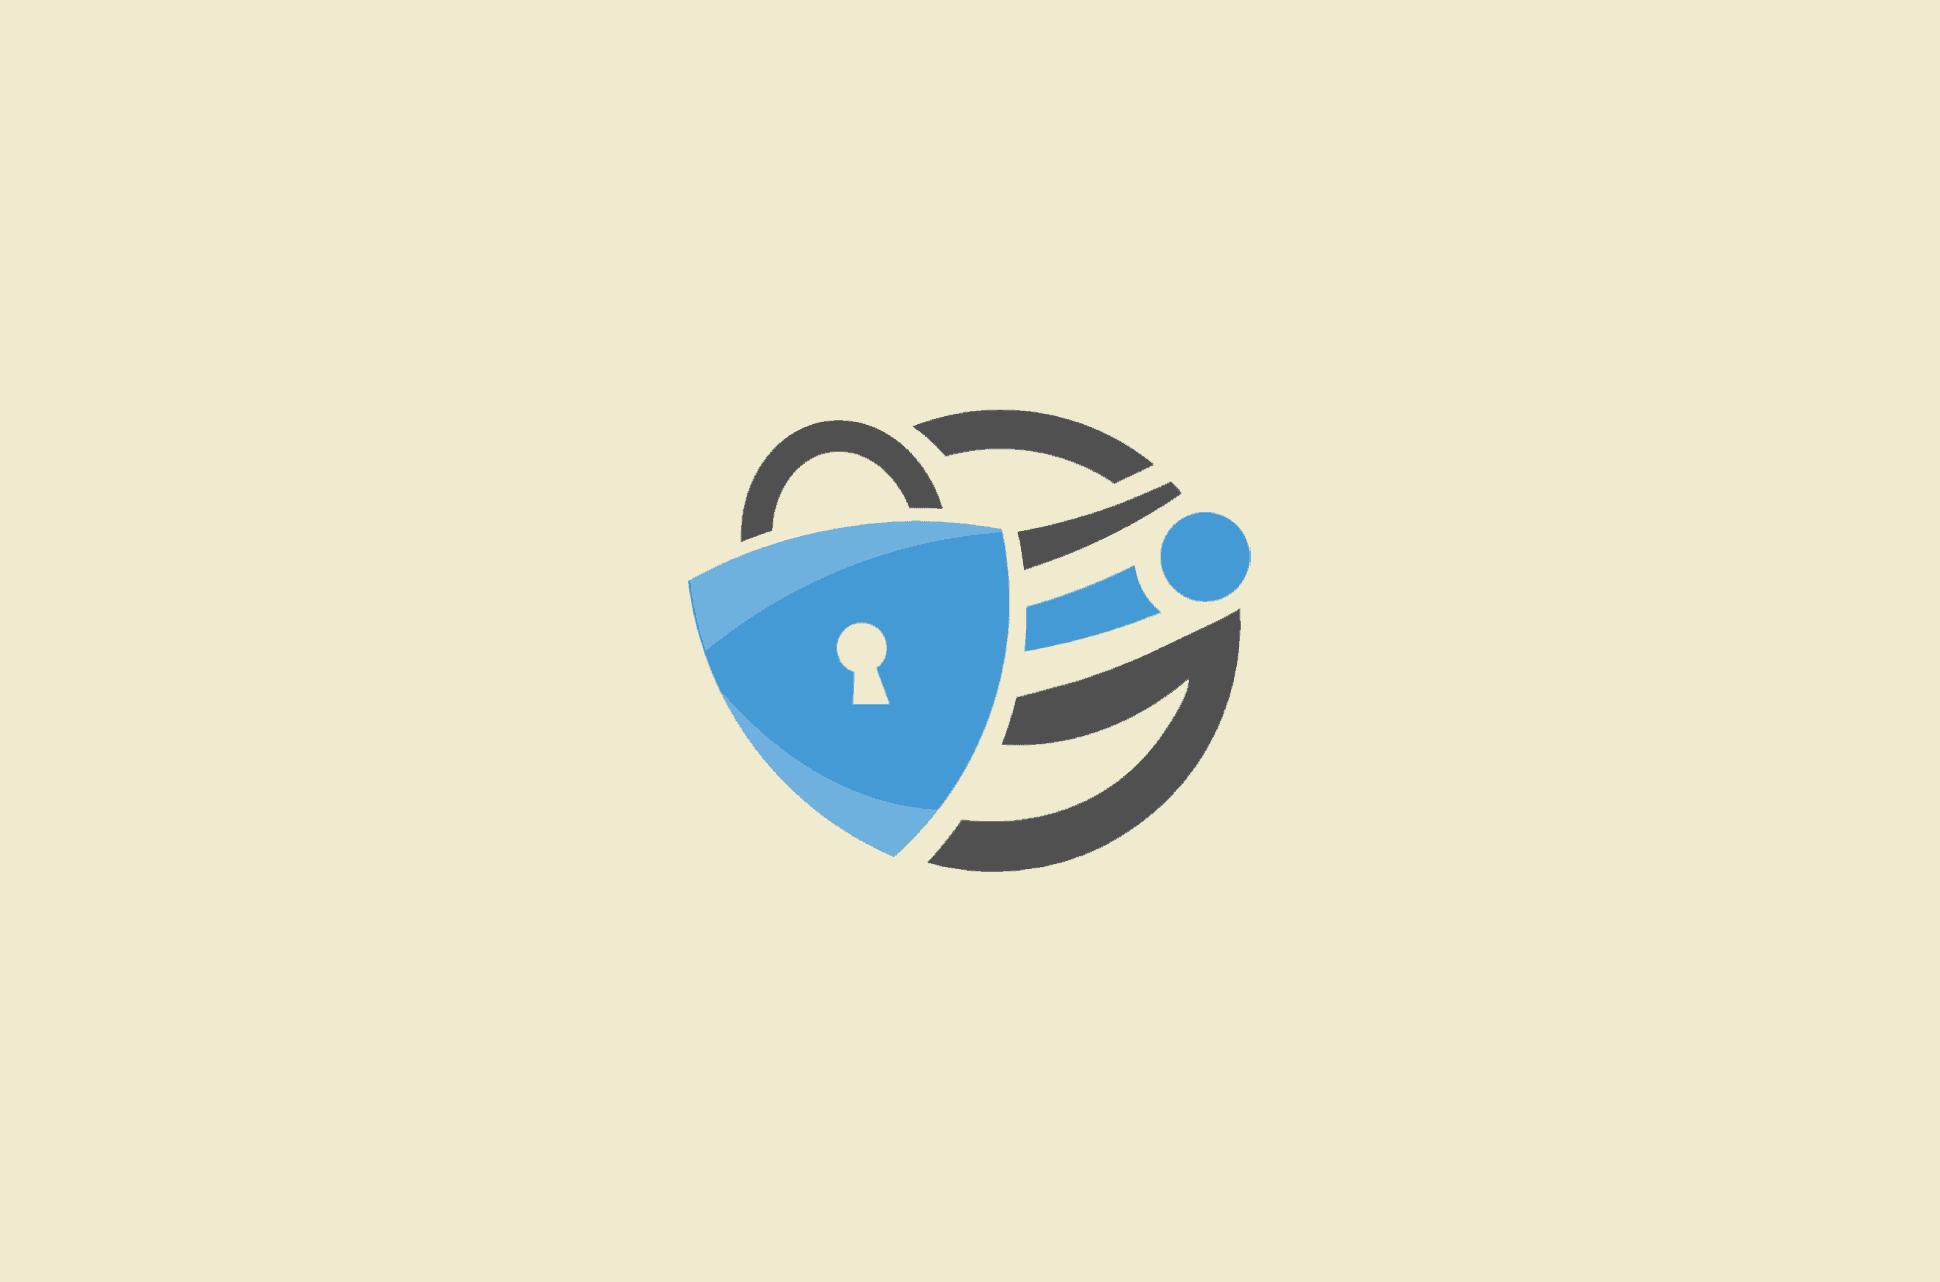 Iridium browser logo.